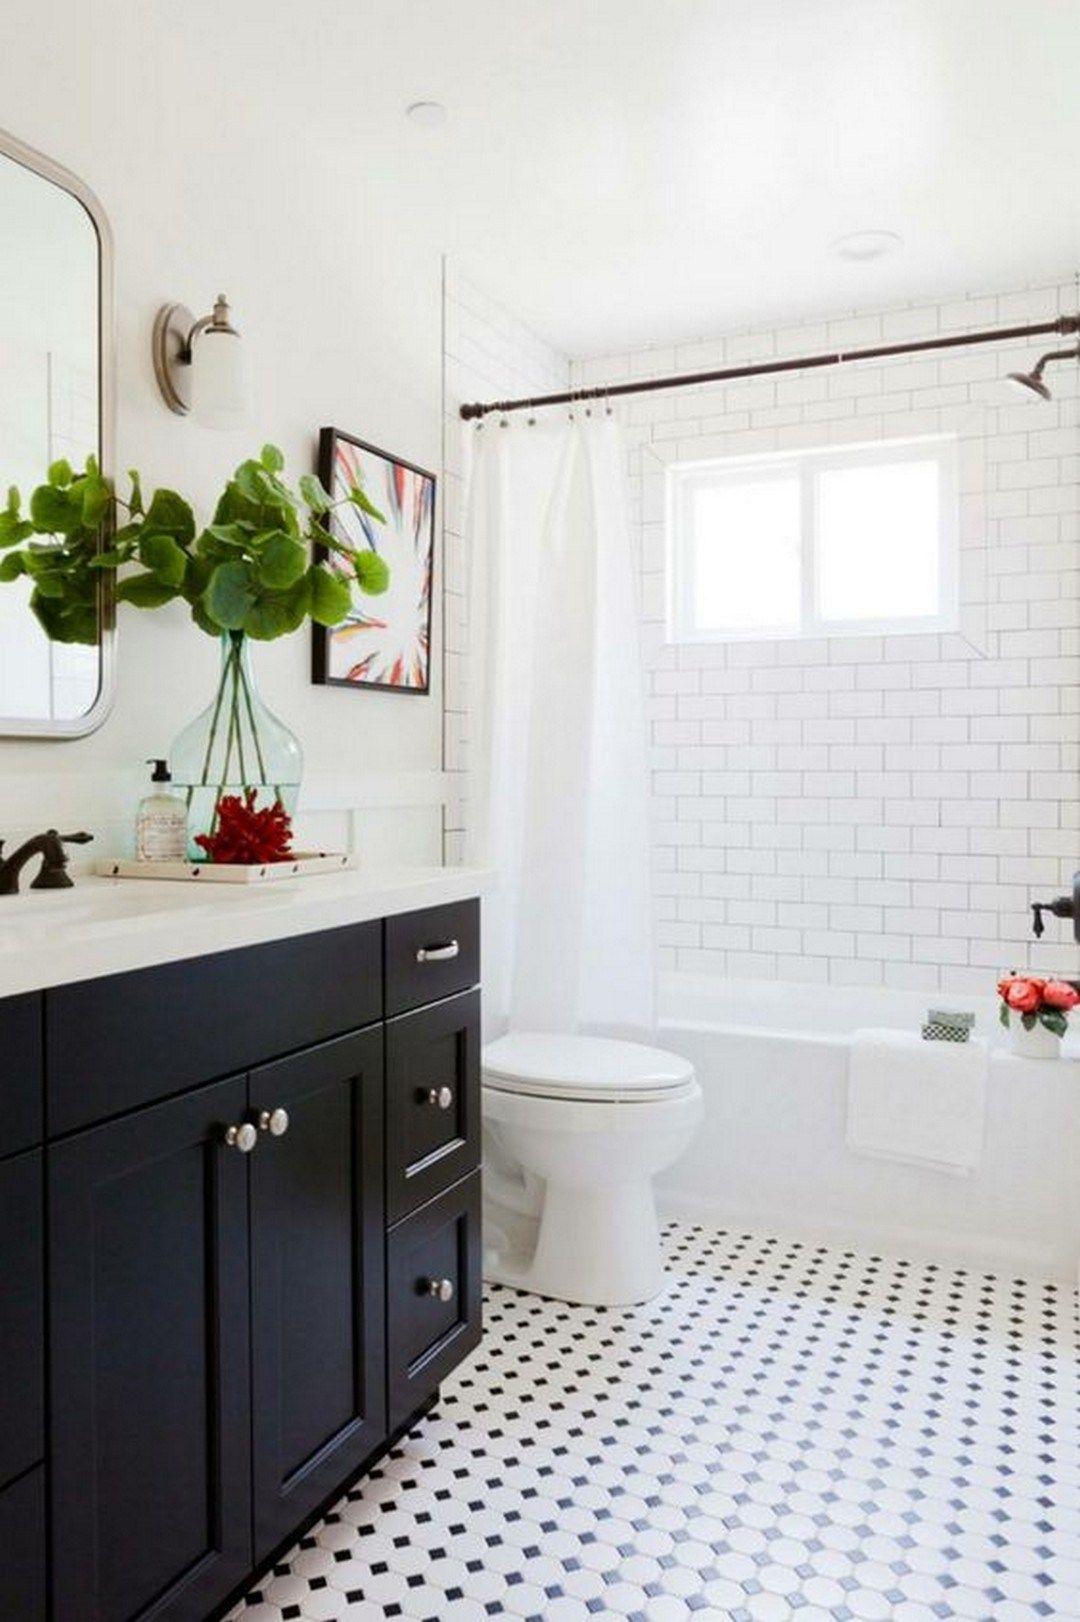 99 Small Master Bathroom Makeover Ideas On A Budget (62) | Bathroom ...